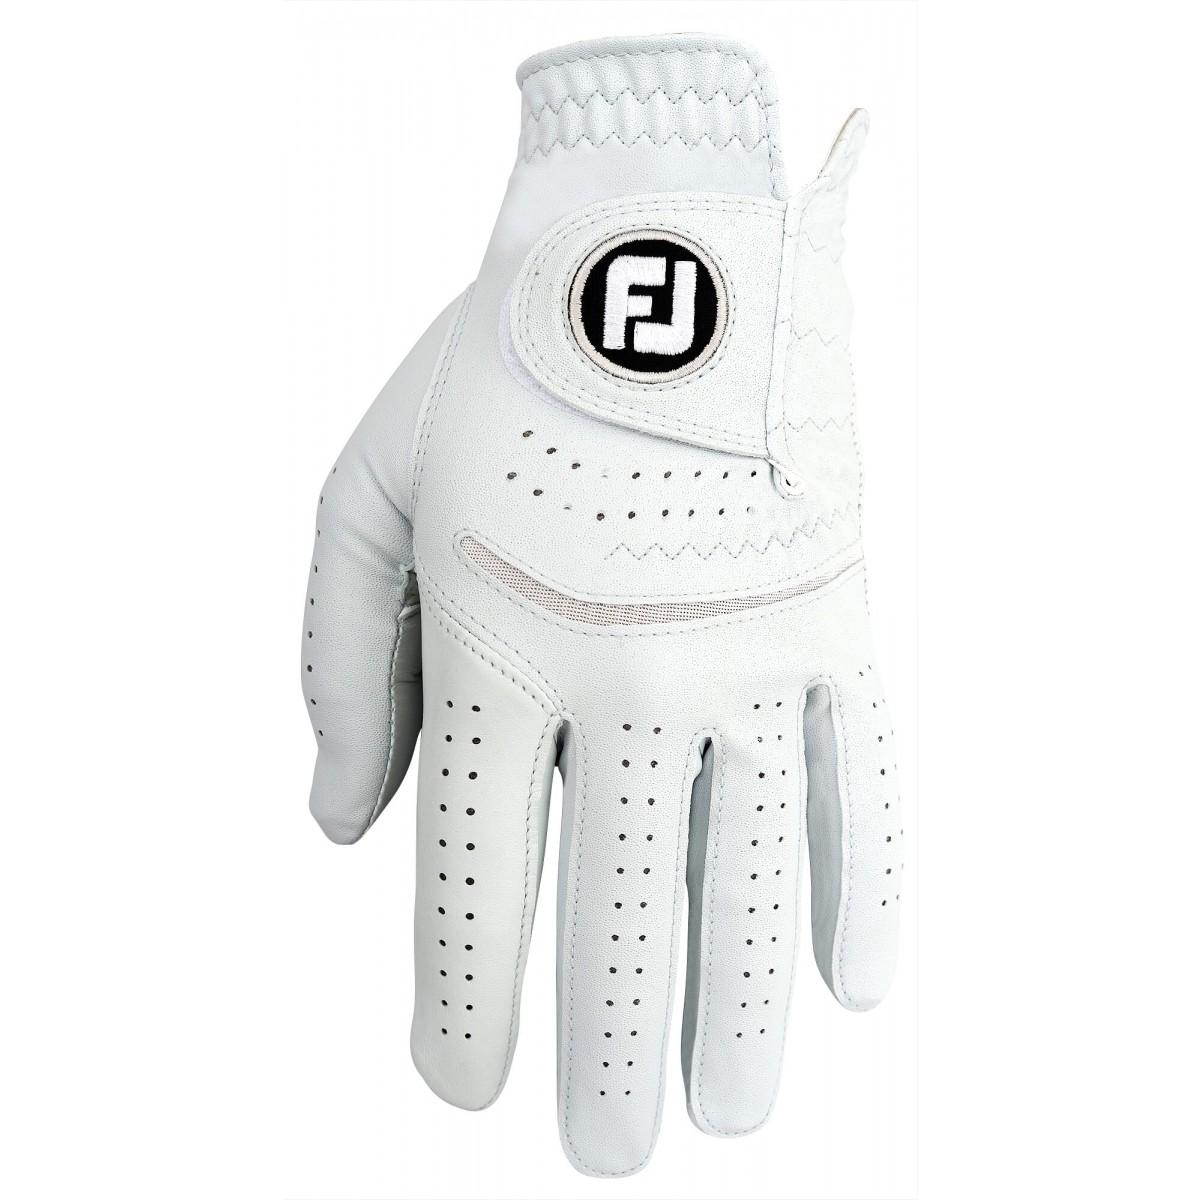 FootJoy Men's 2020 Contour FLX Golf Glove - Left Hand Cadet